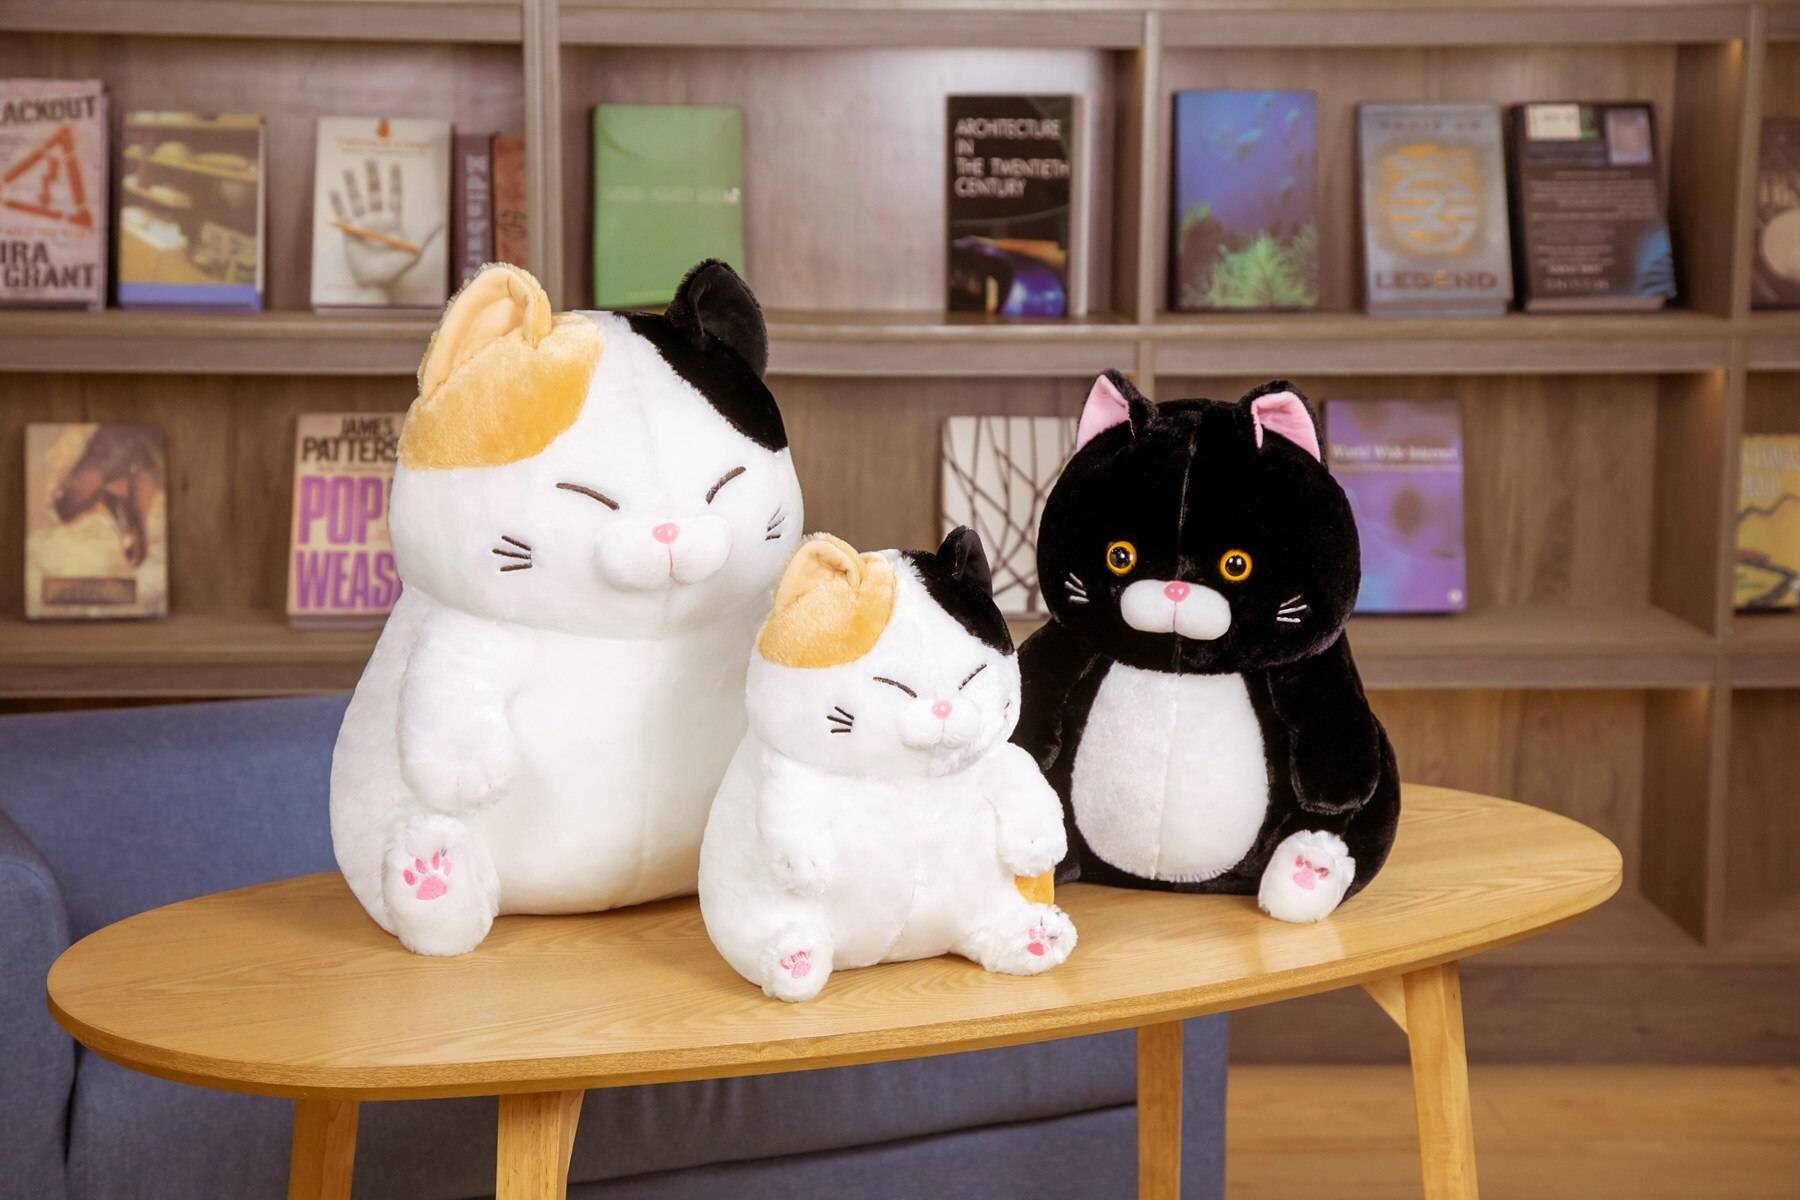 Cat Toys Stuffed Animals Janpanese Anime Pusheen Plushie Soft Cute Black Cat Doll Room Decor Birthday Gift For Girls Kids